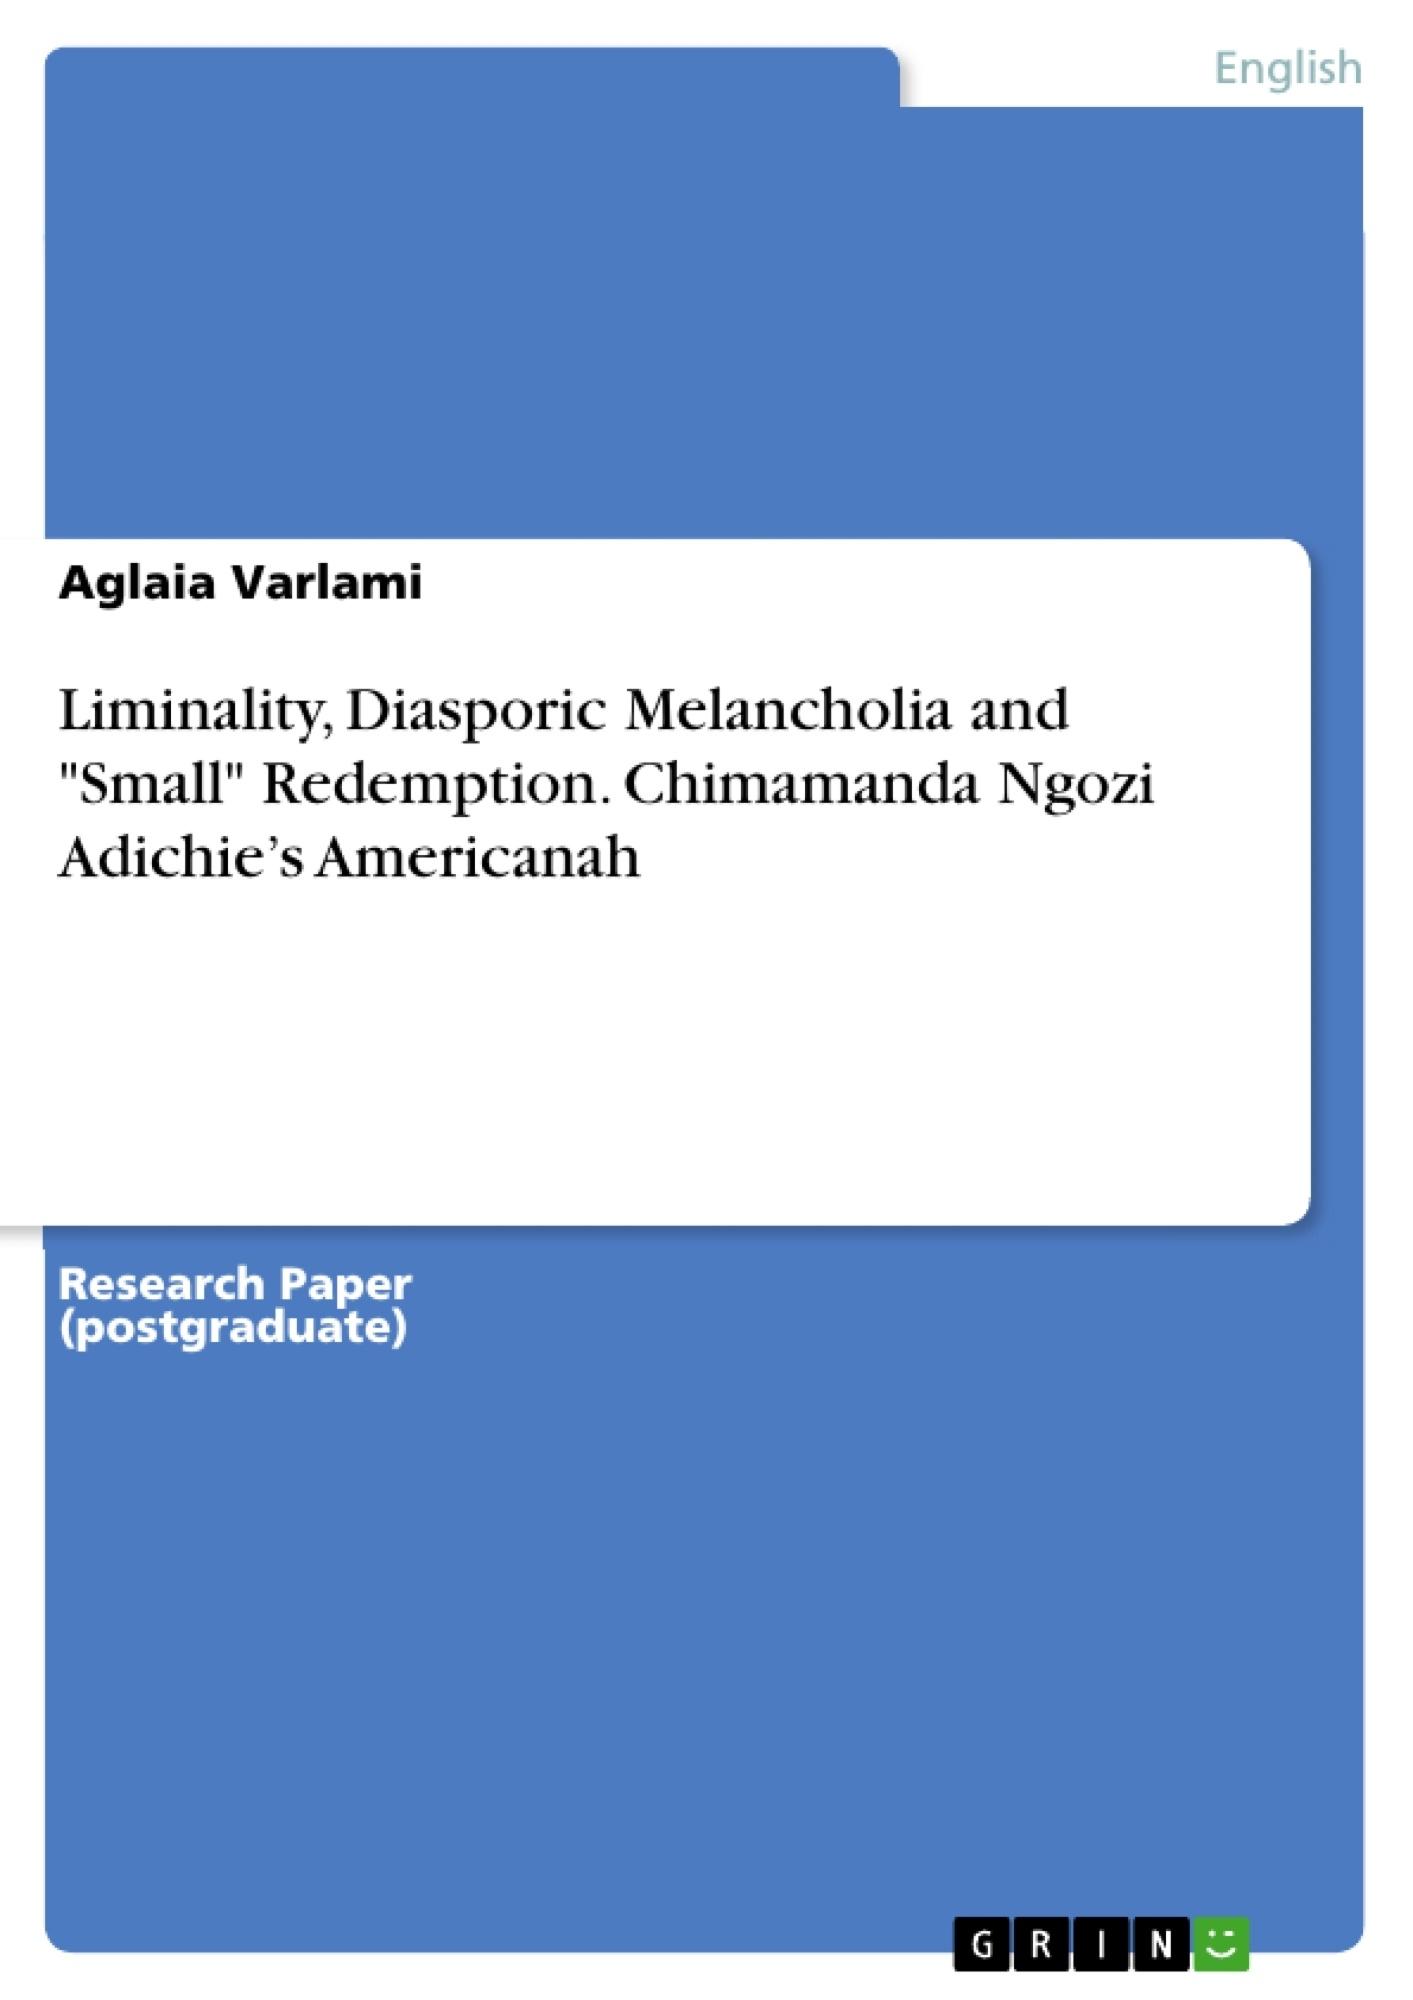 "Title: Liminality, Diasporic Melancholia and ""Small"" Redemption. Chimamanda Ngozi Adichie's Americanah"